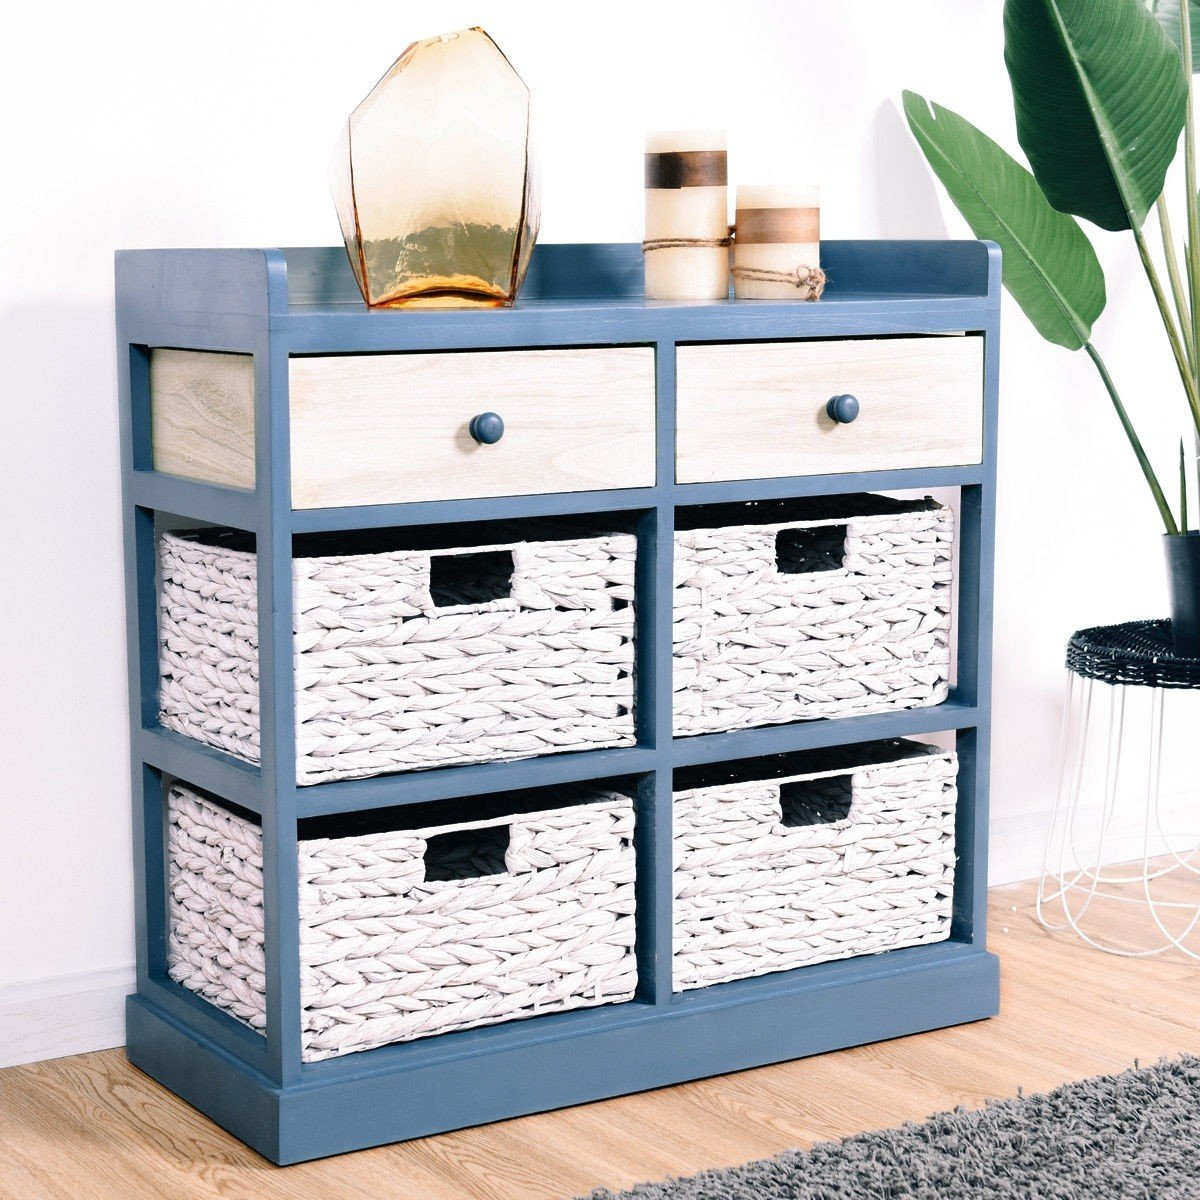 BESTChoiceForYou Cabinet Table Storage Side Wood Drawers Console Sideboard Cupboard W Furniture End Vidaxl White Baskets Drawer Door Home by BESTChoiceForYou (Image #3)